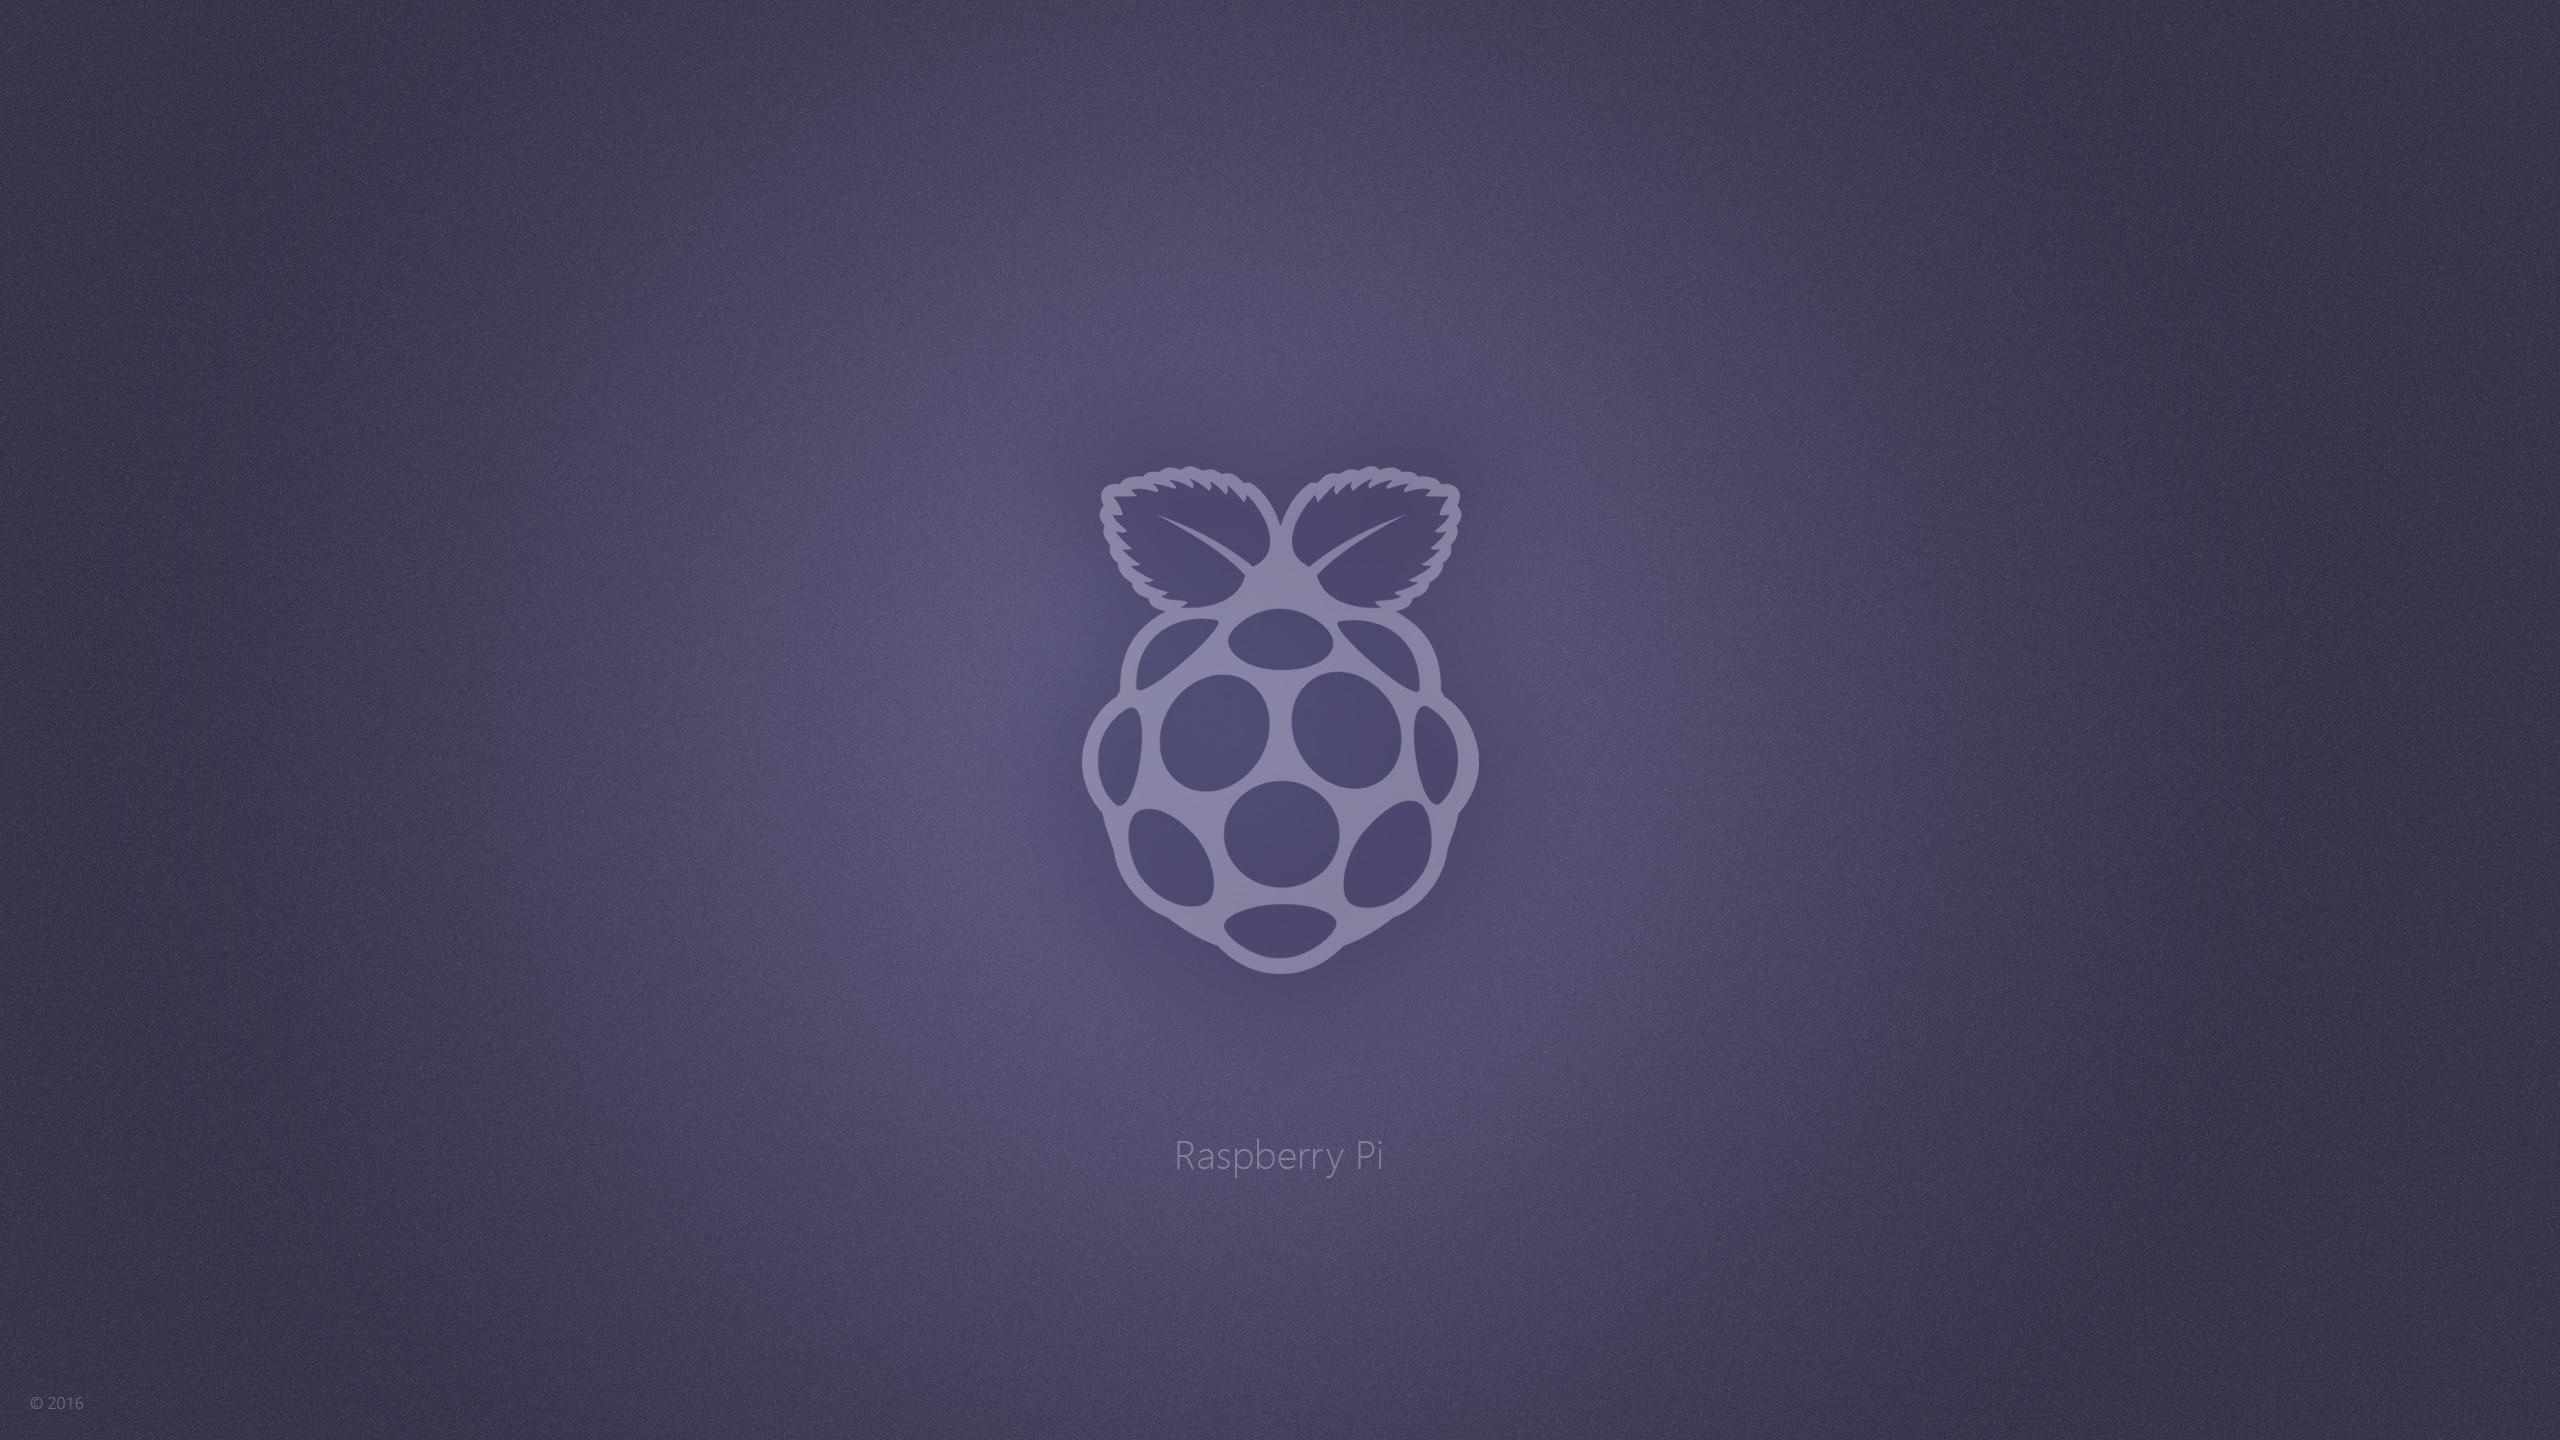 Raspberry Pi Wallpapers, Raspberry Pi HD Wallpapers, 2105.12 Kb, Lecia Rico